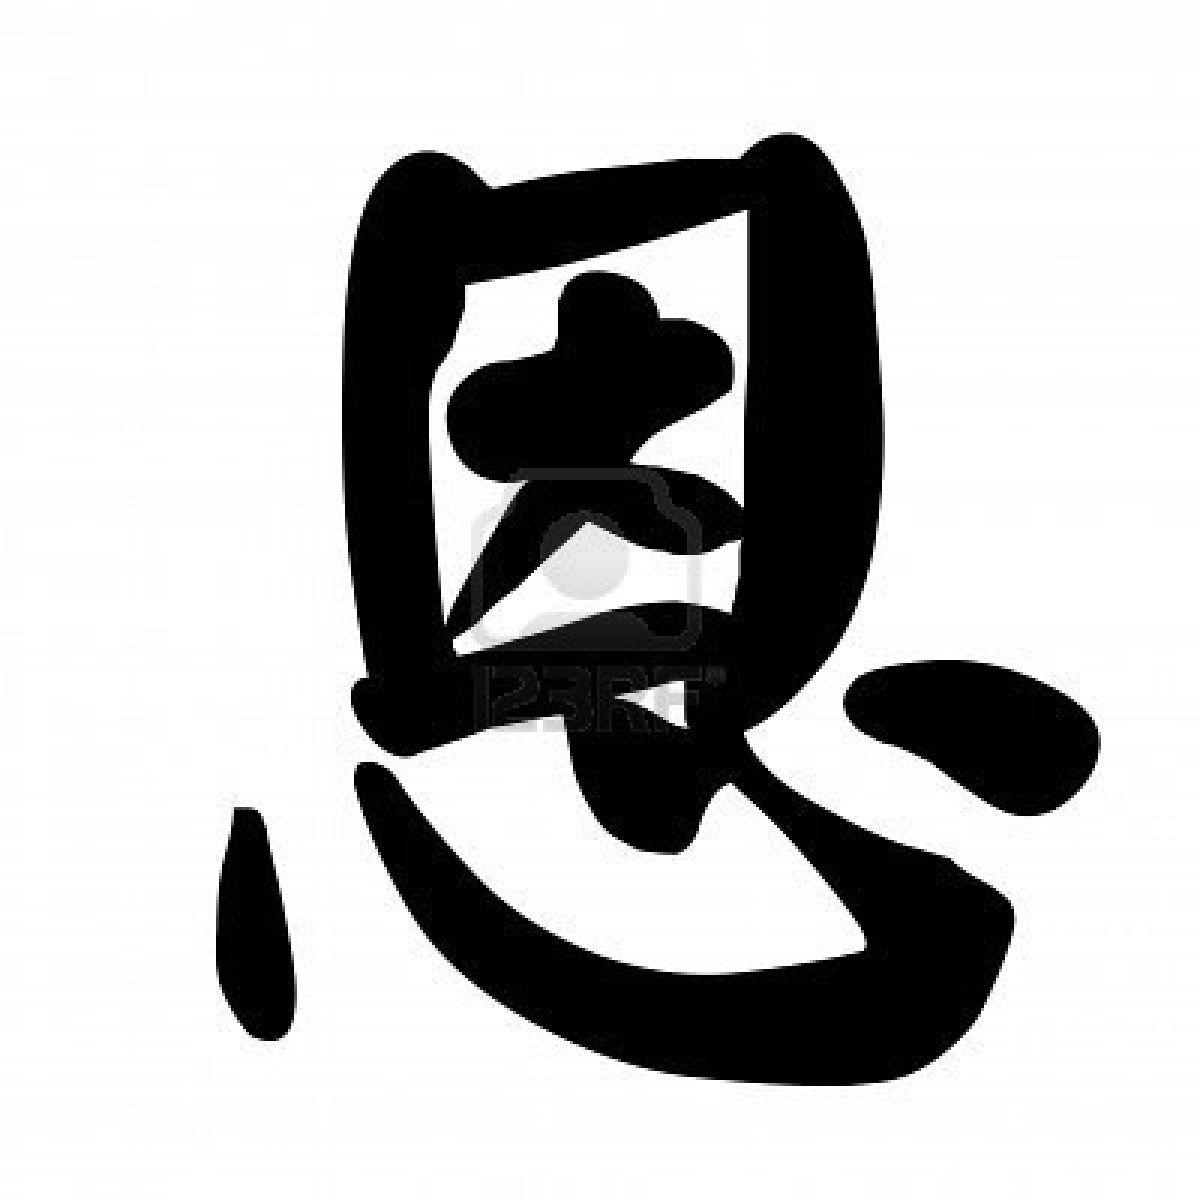 Chinese calligraphy grace tea destination china pinterest sign for grace in chinese calligraphy buycottarizona Choice Image